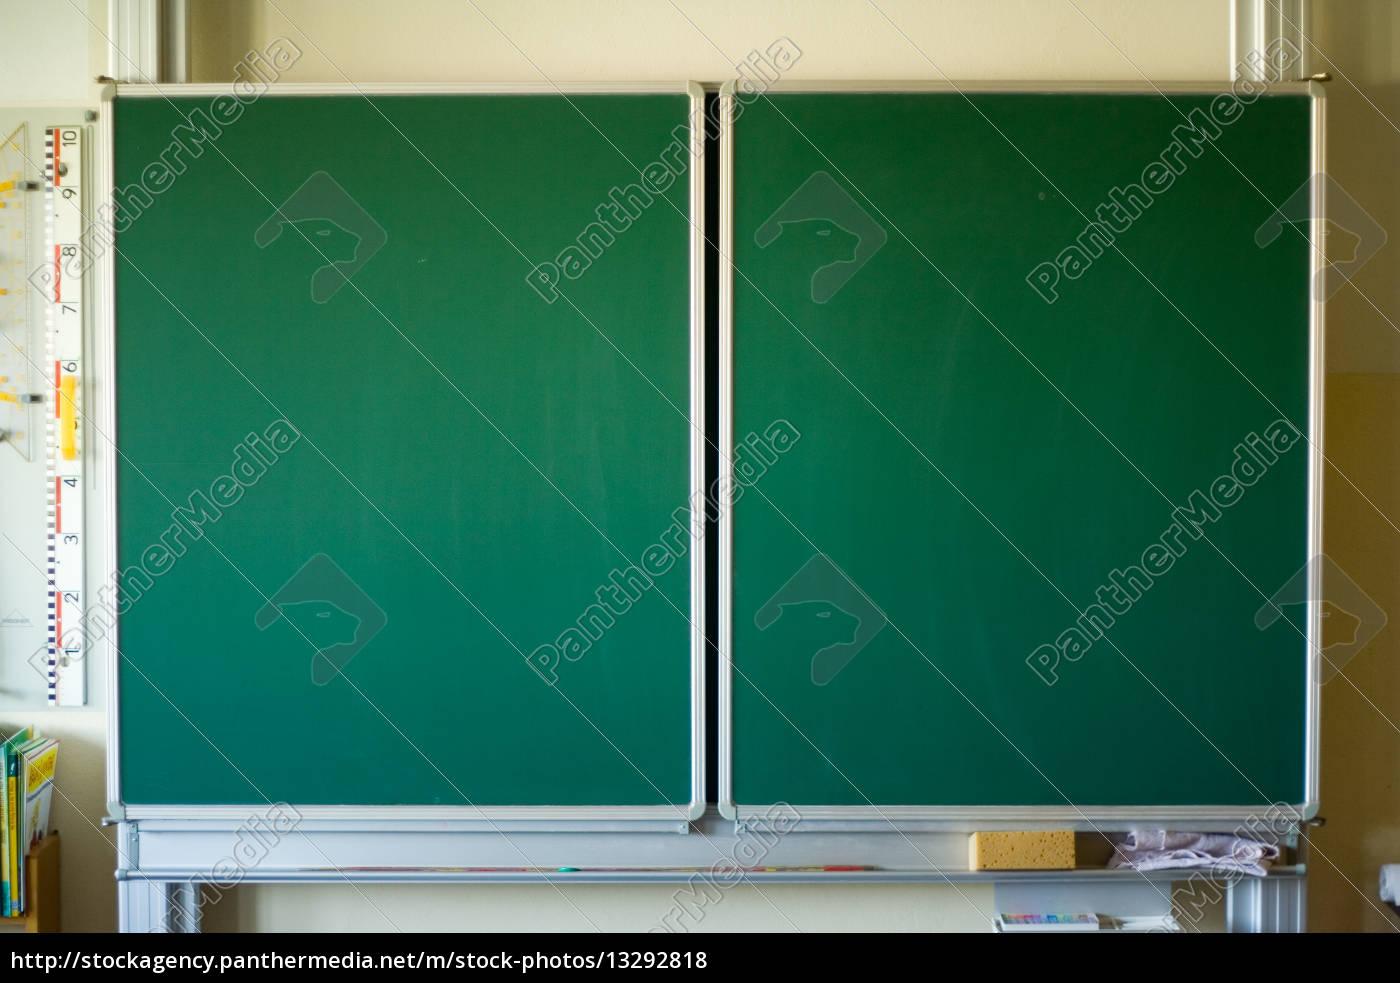 gr u00fcn tag schreiben schule leer bildung tafel gruen   Stock Photo   #13292818   Bildagentur